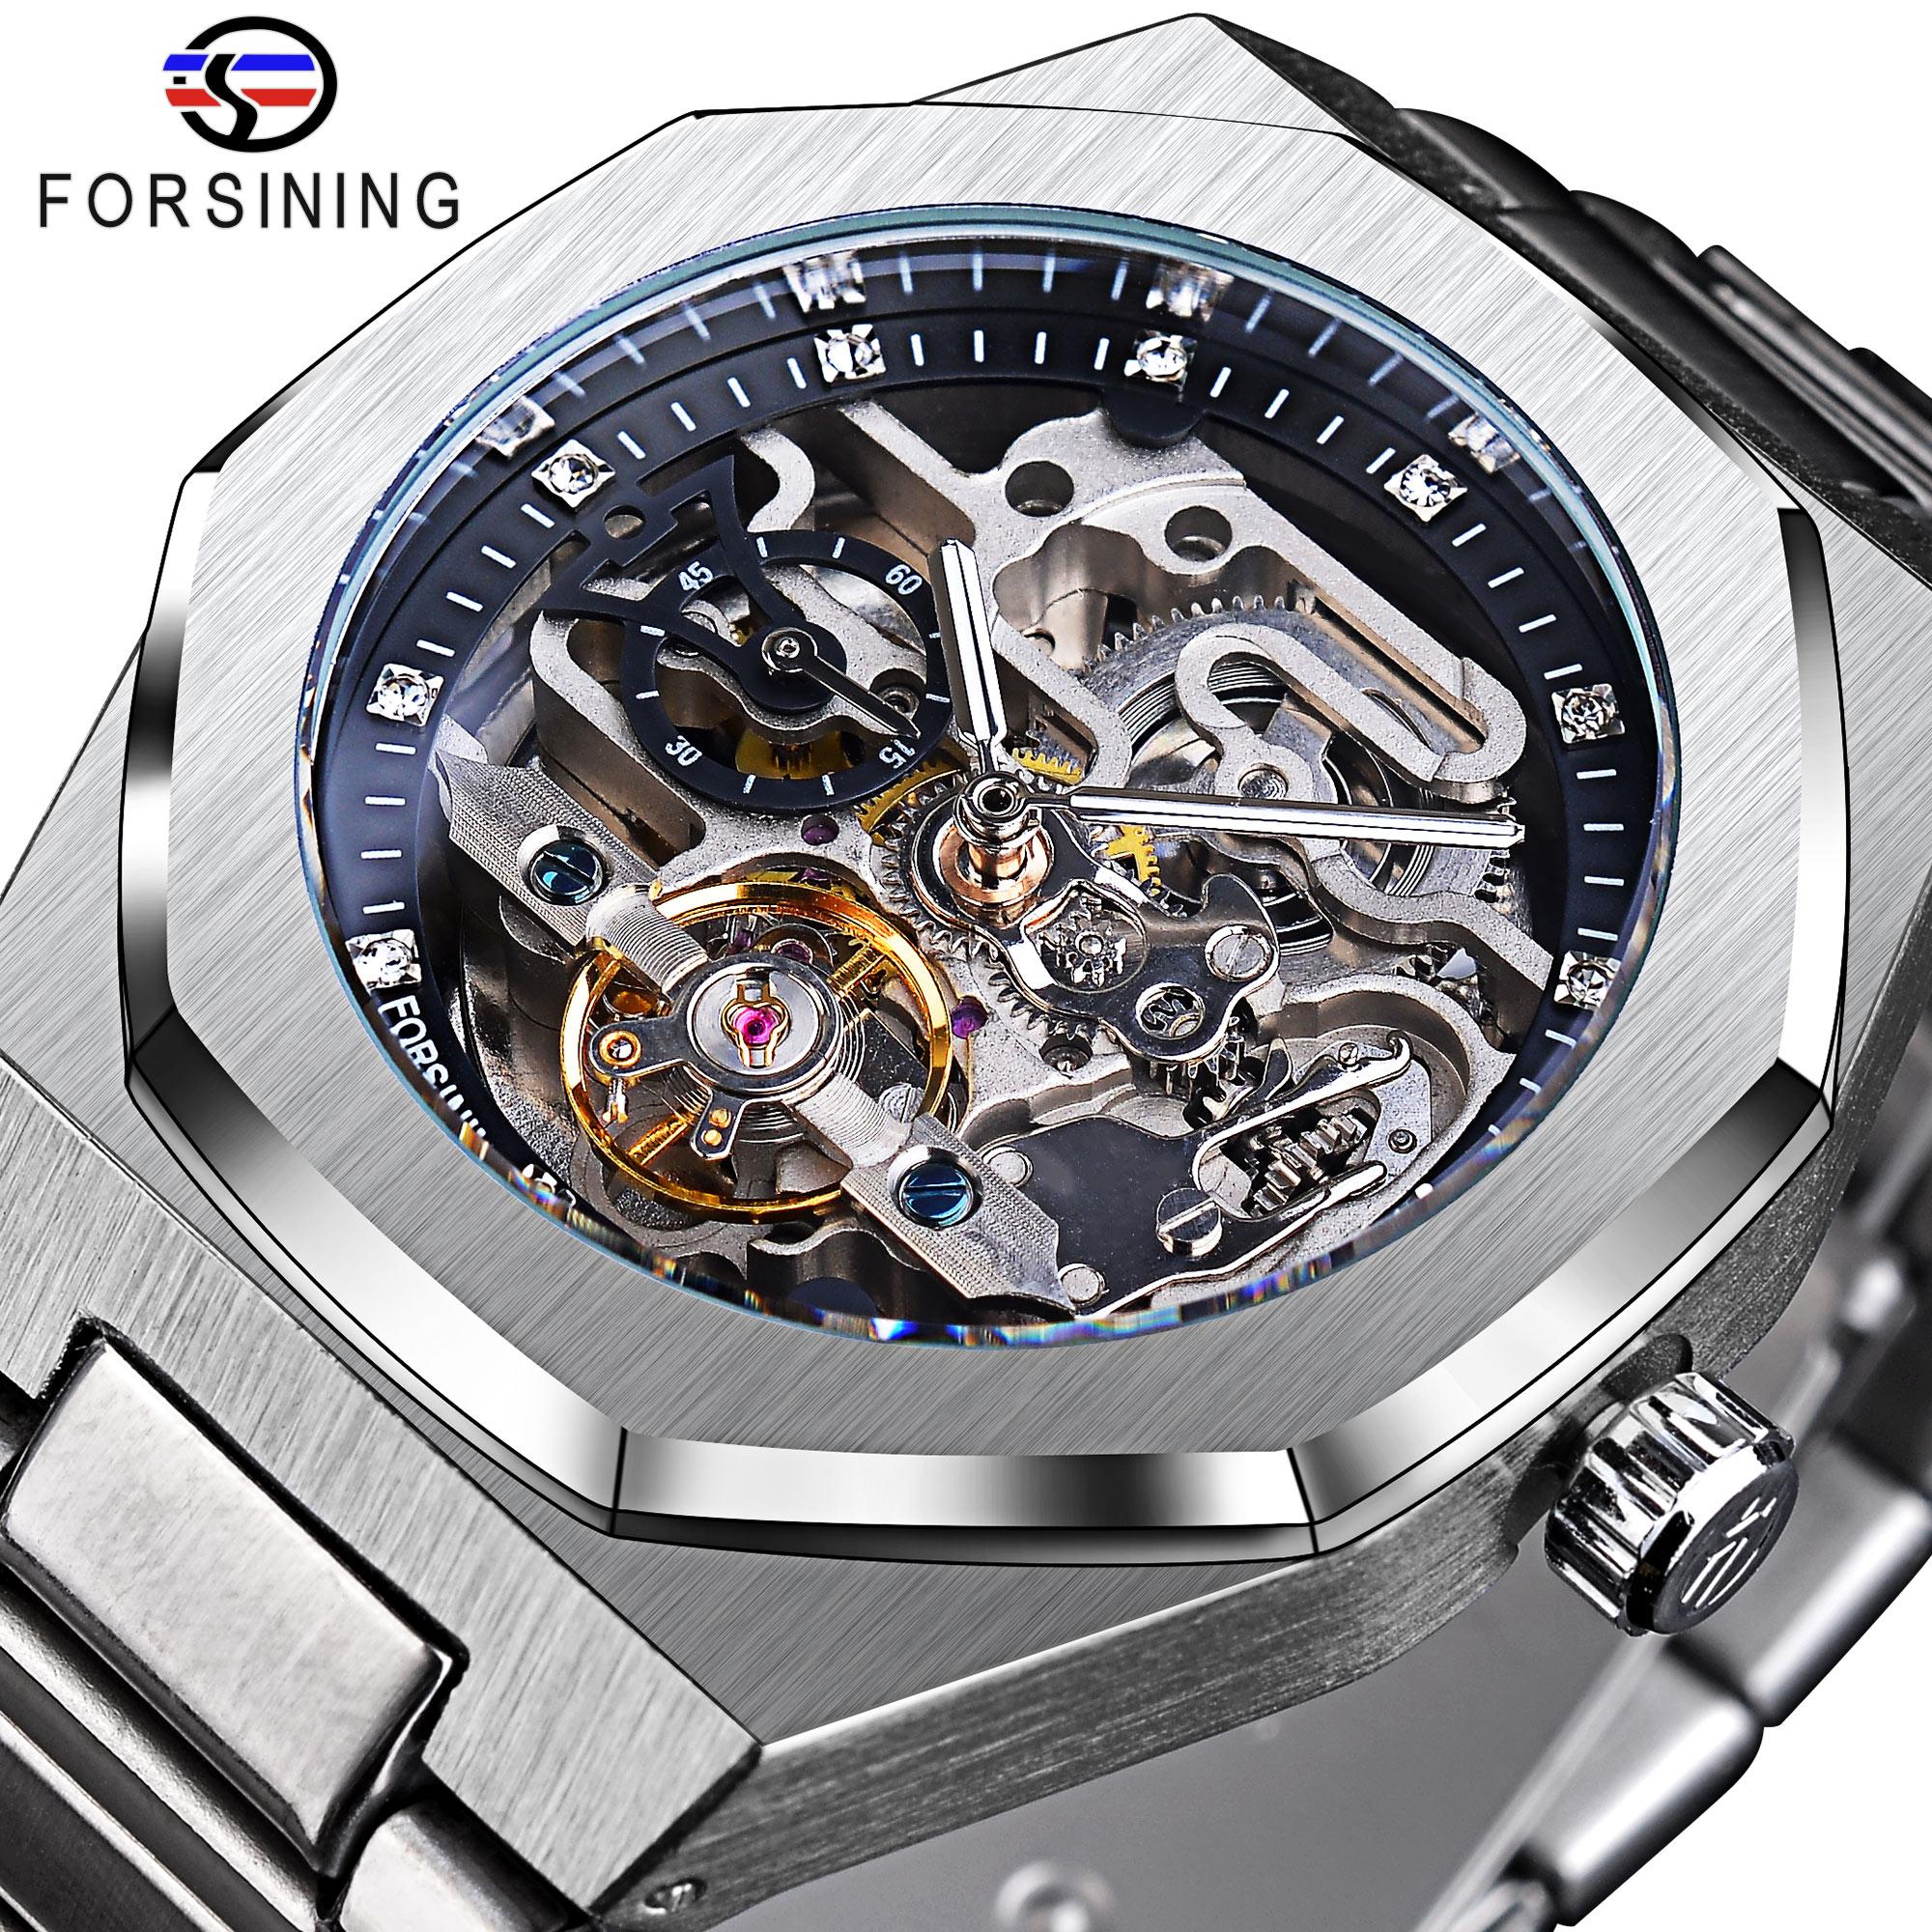 Forsining Silver Automatic Mechanical Watch Skeleton Hollow Mens Wristwatches Luminous Military Watches Tourbillon Montre Homme